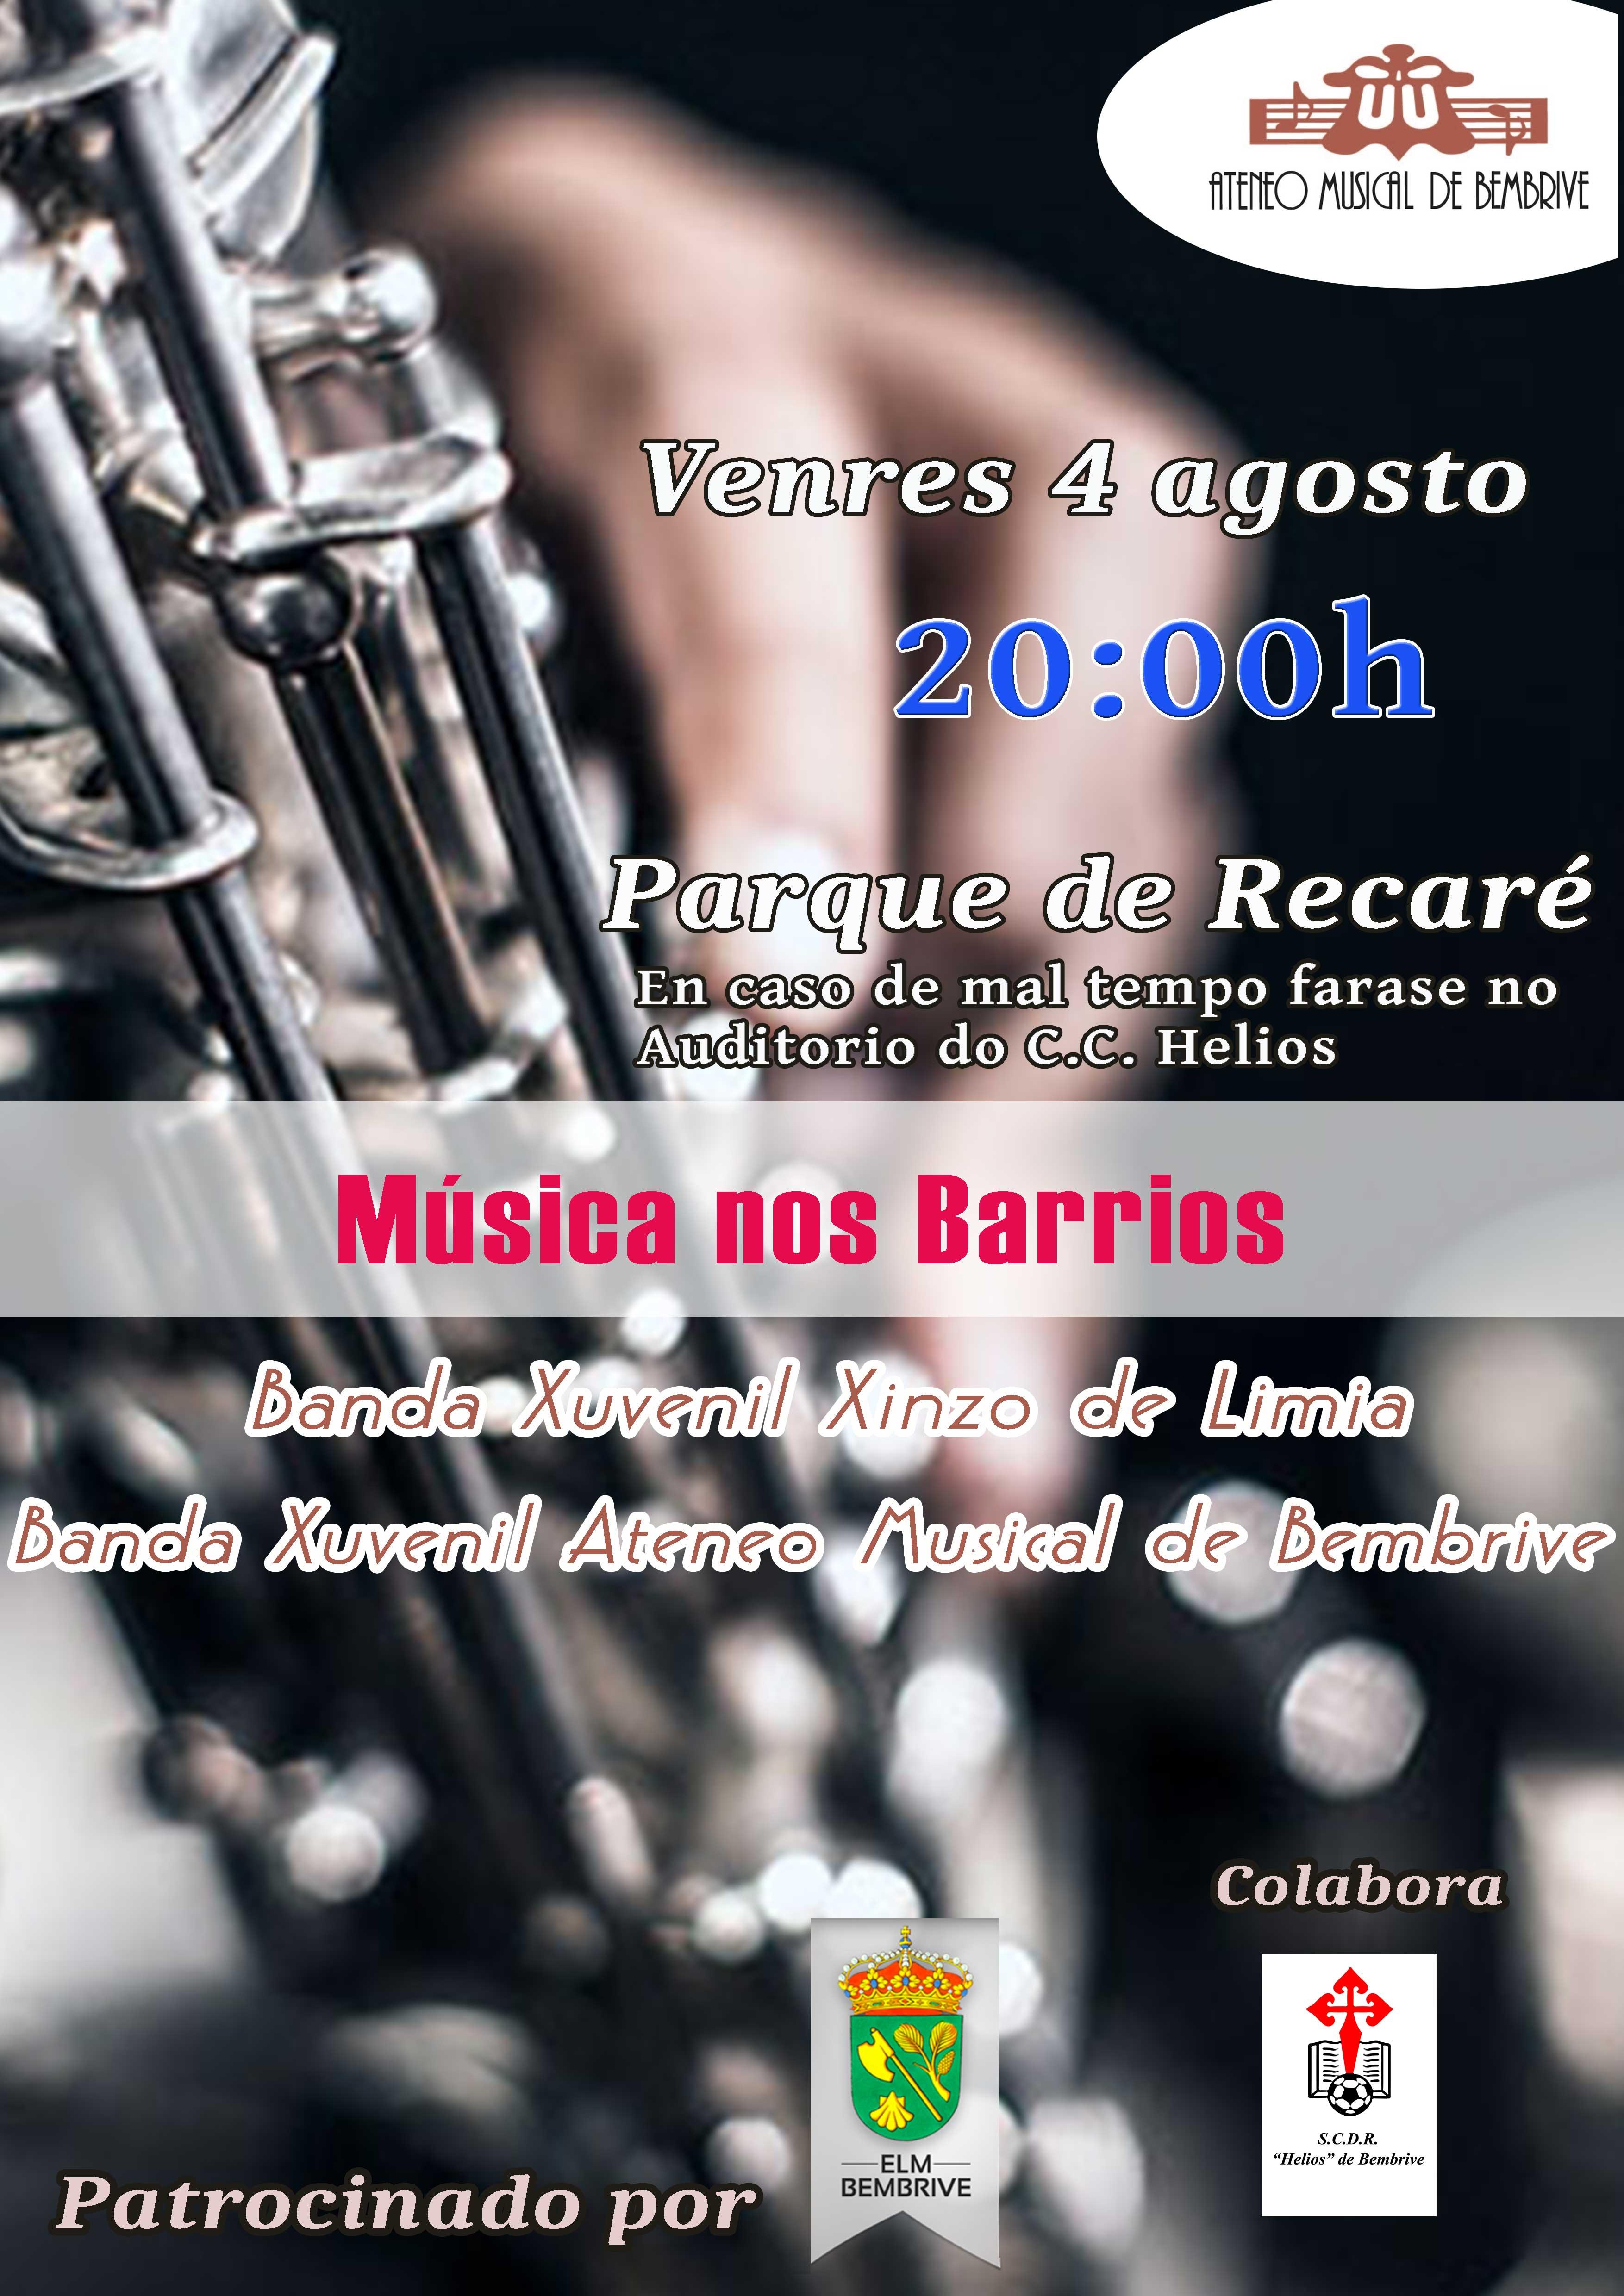 Festival Bandas Juveniles Bembrive 2017